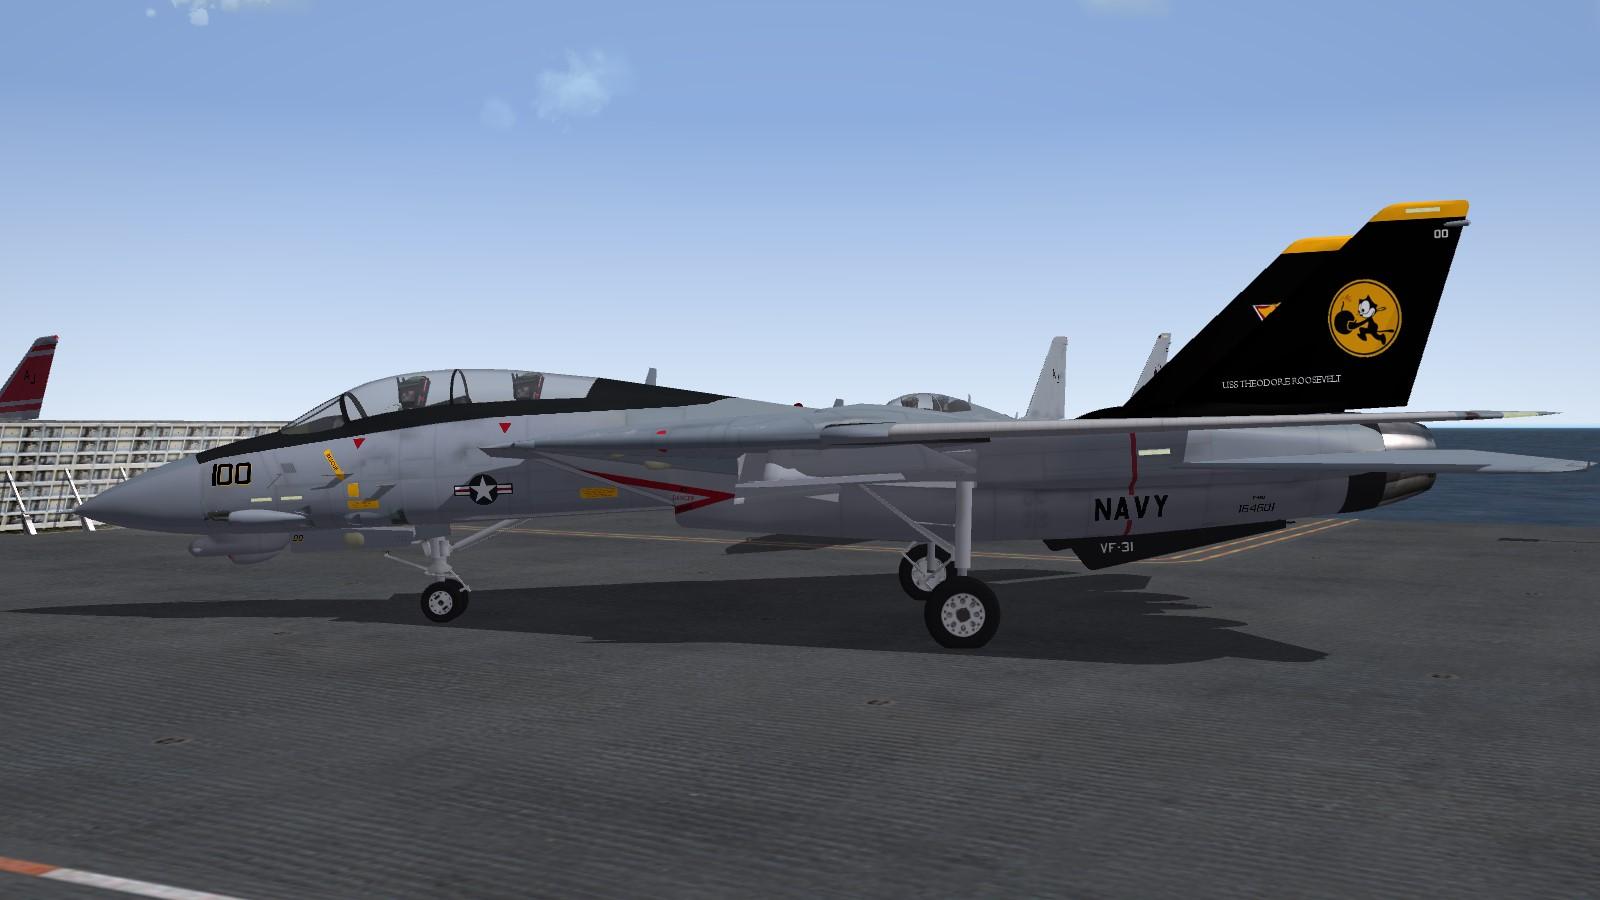 VF-31 Last Tomcat Cruise